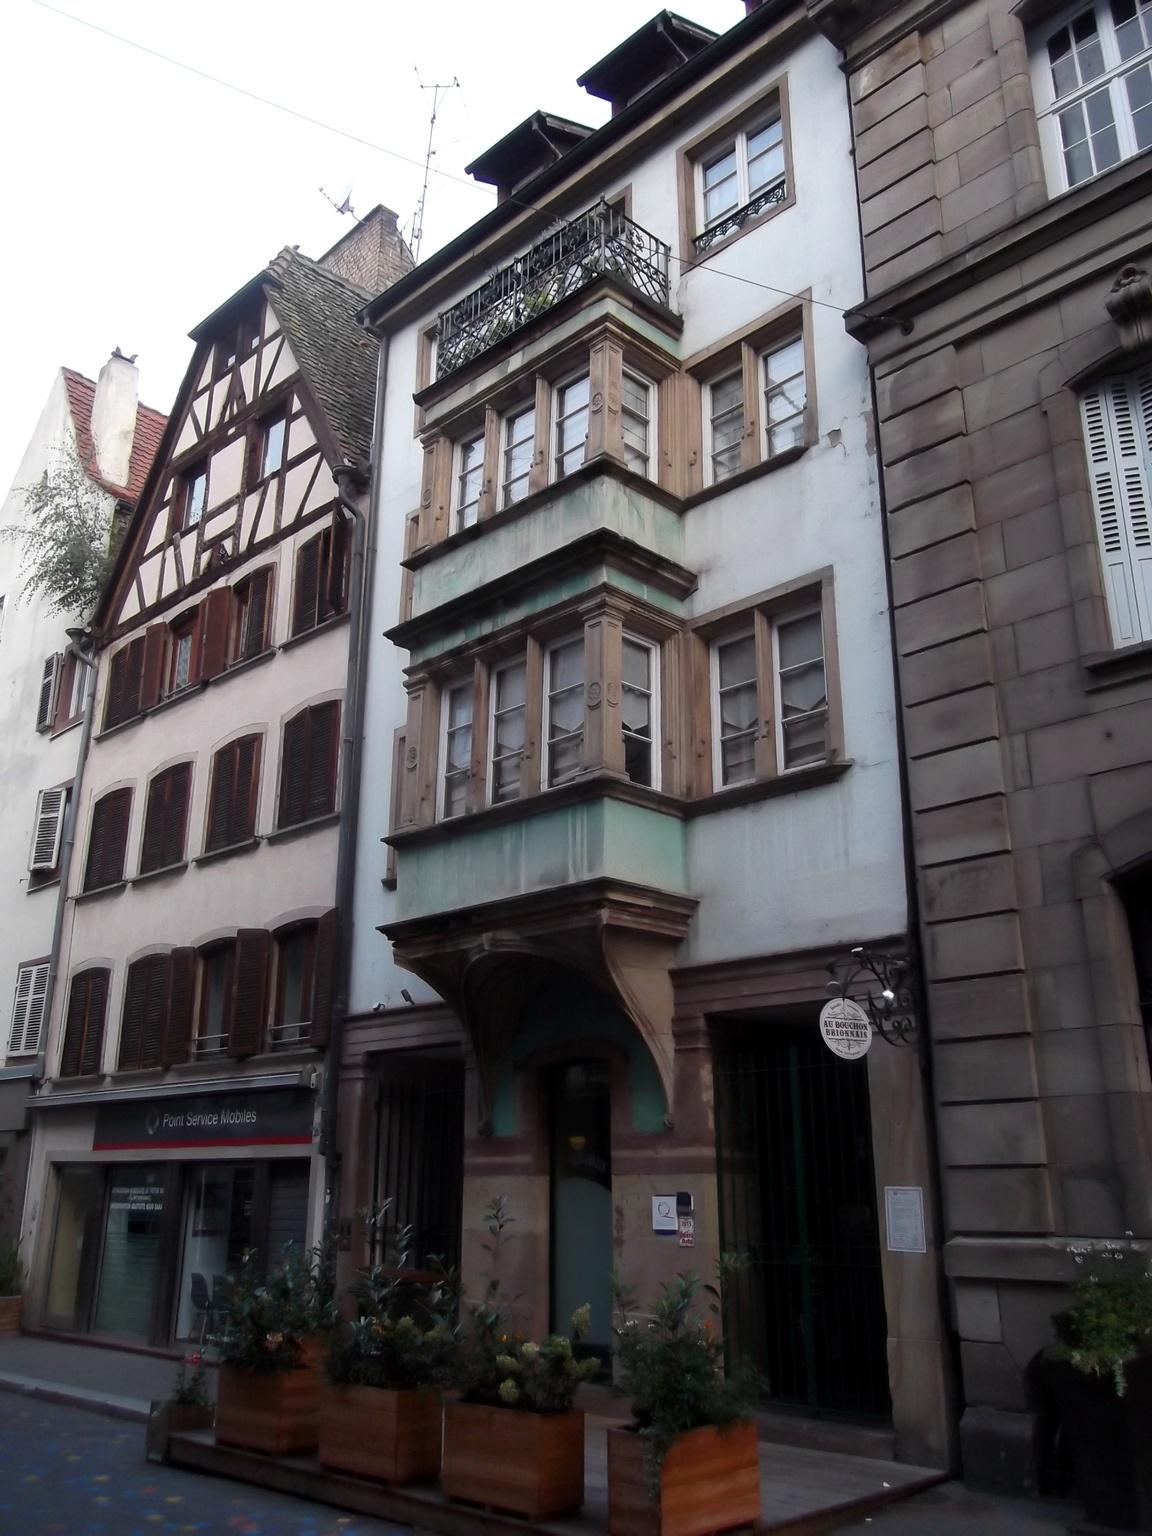 Meubles 3 Fontaines Ittenheim maisons de strasbourg » résultats de recherche »